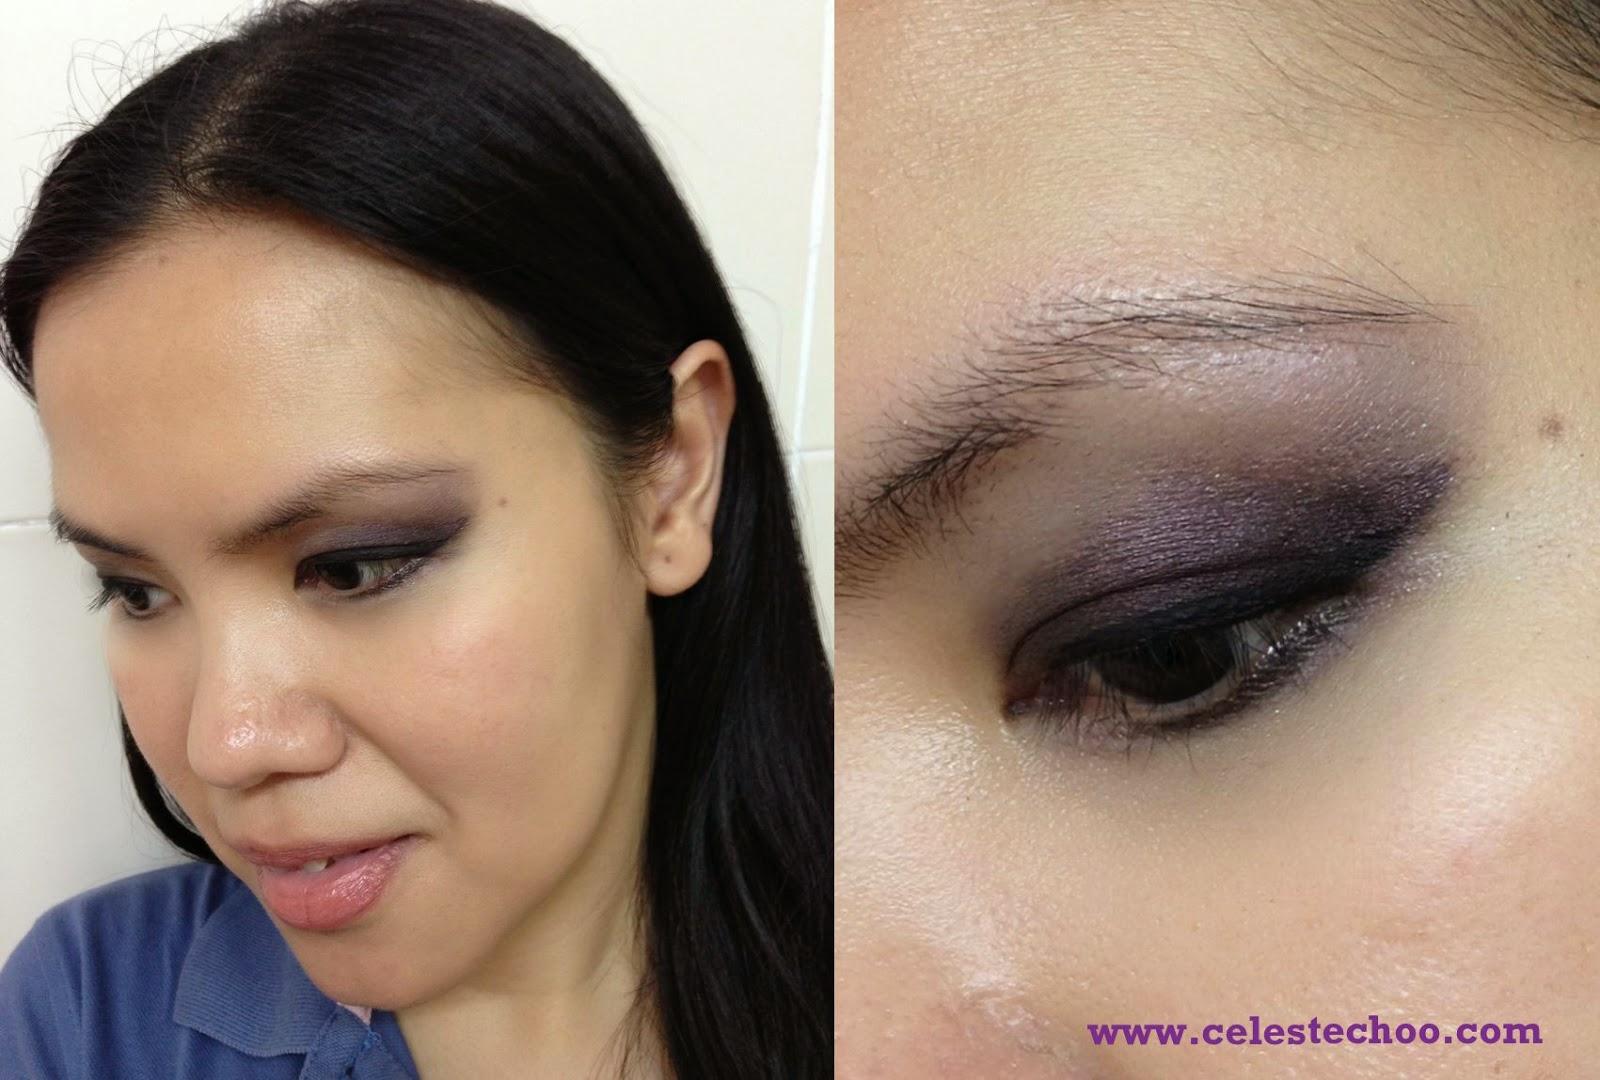 nars_cosmetics_beauty_makeup_eyeshadows_brush_closeup